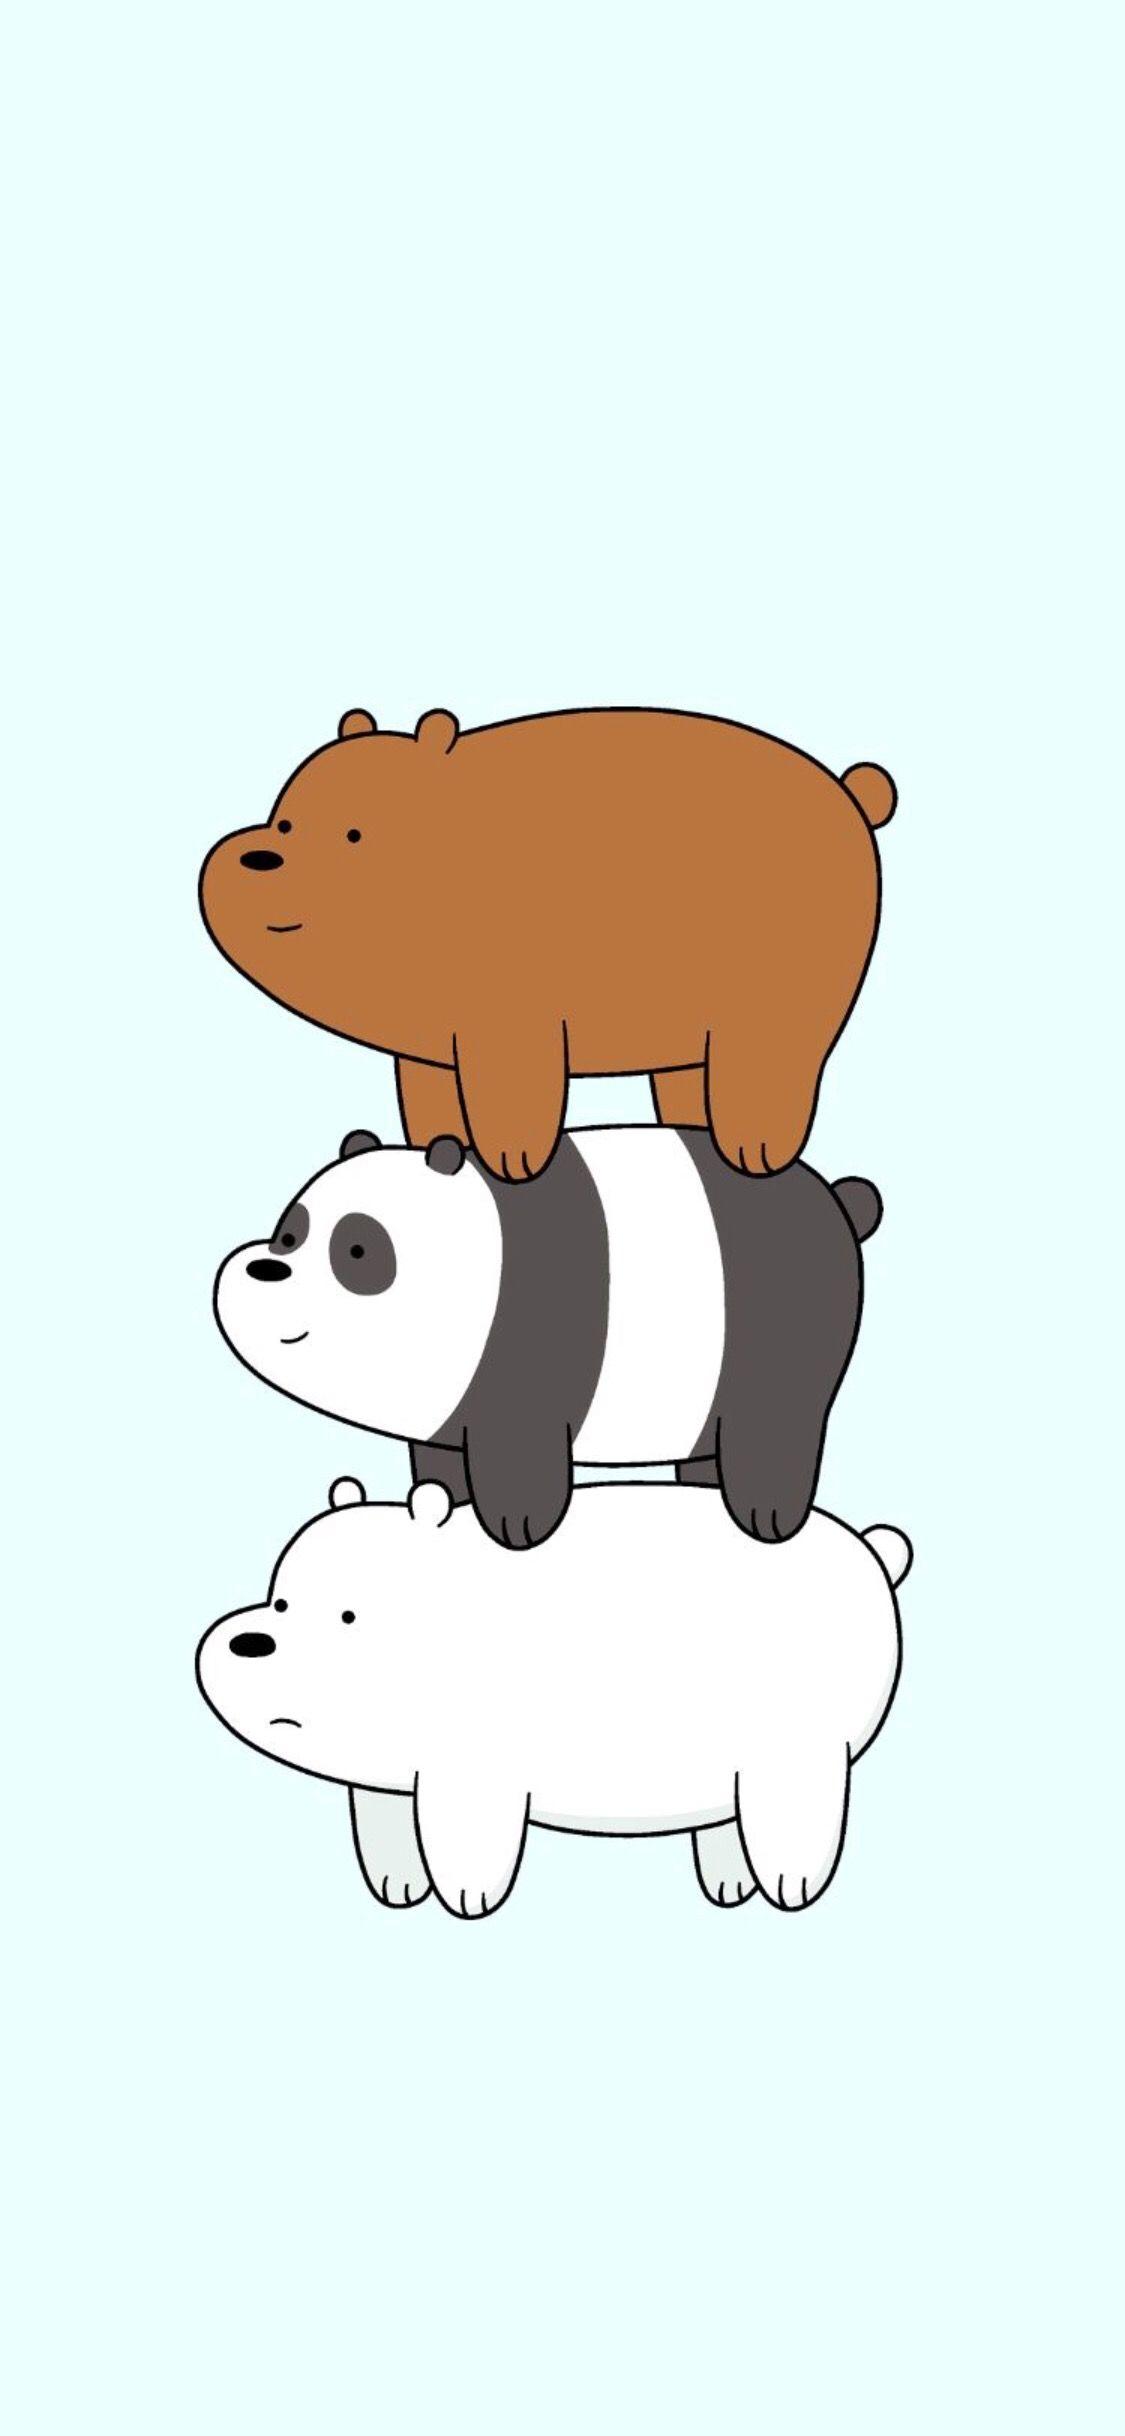 We Bare Bears Wallpaper For Iphone X Kartun Wallpaper Kartun Ilustrasi Lucu